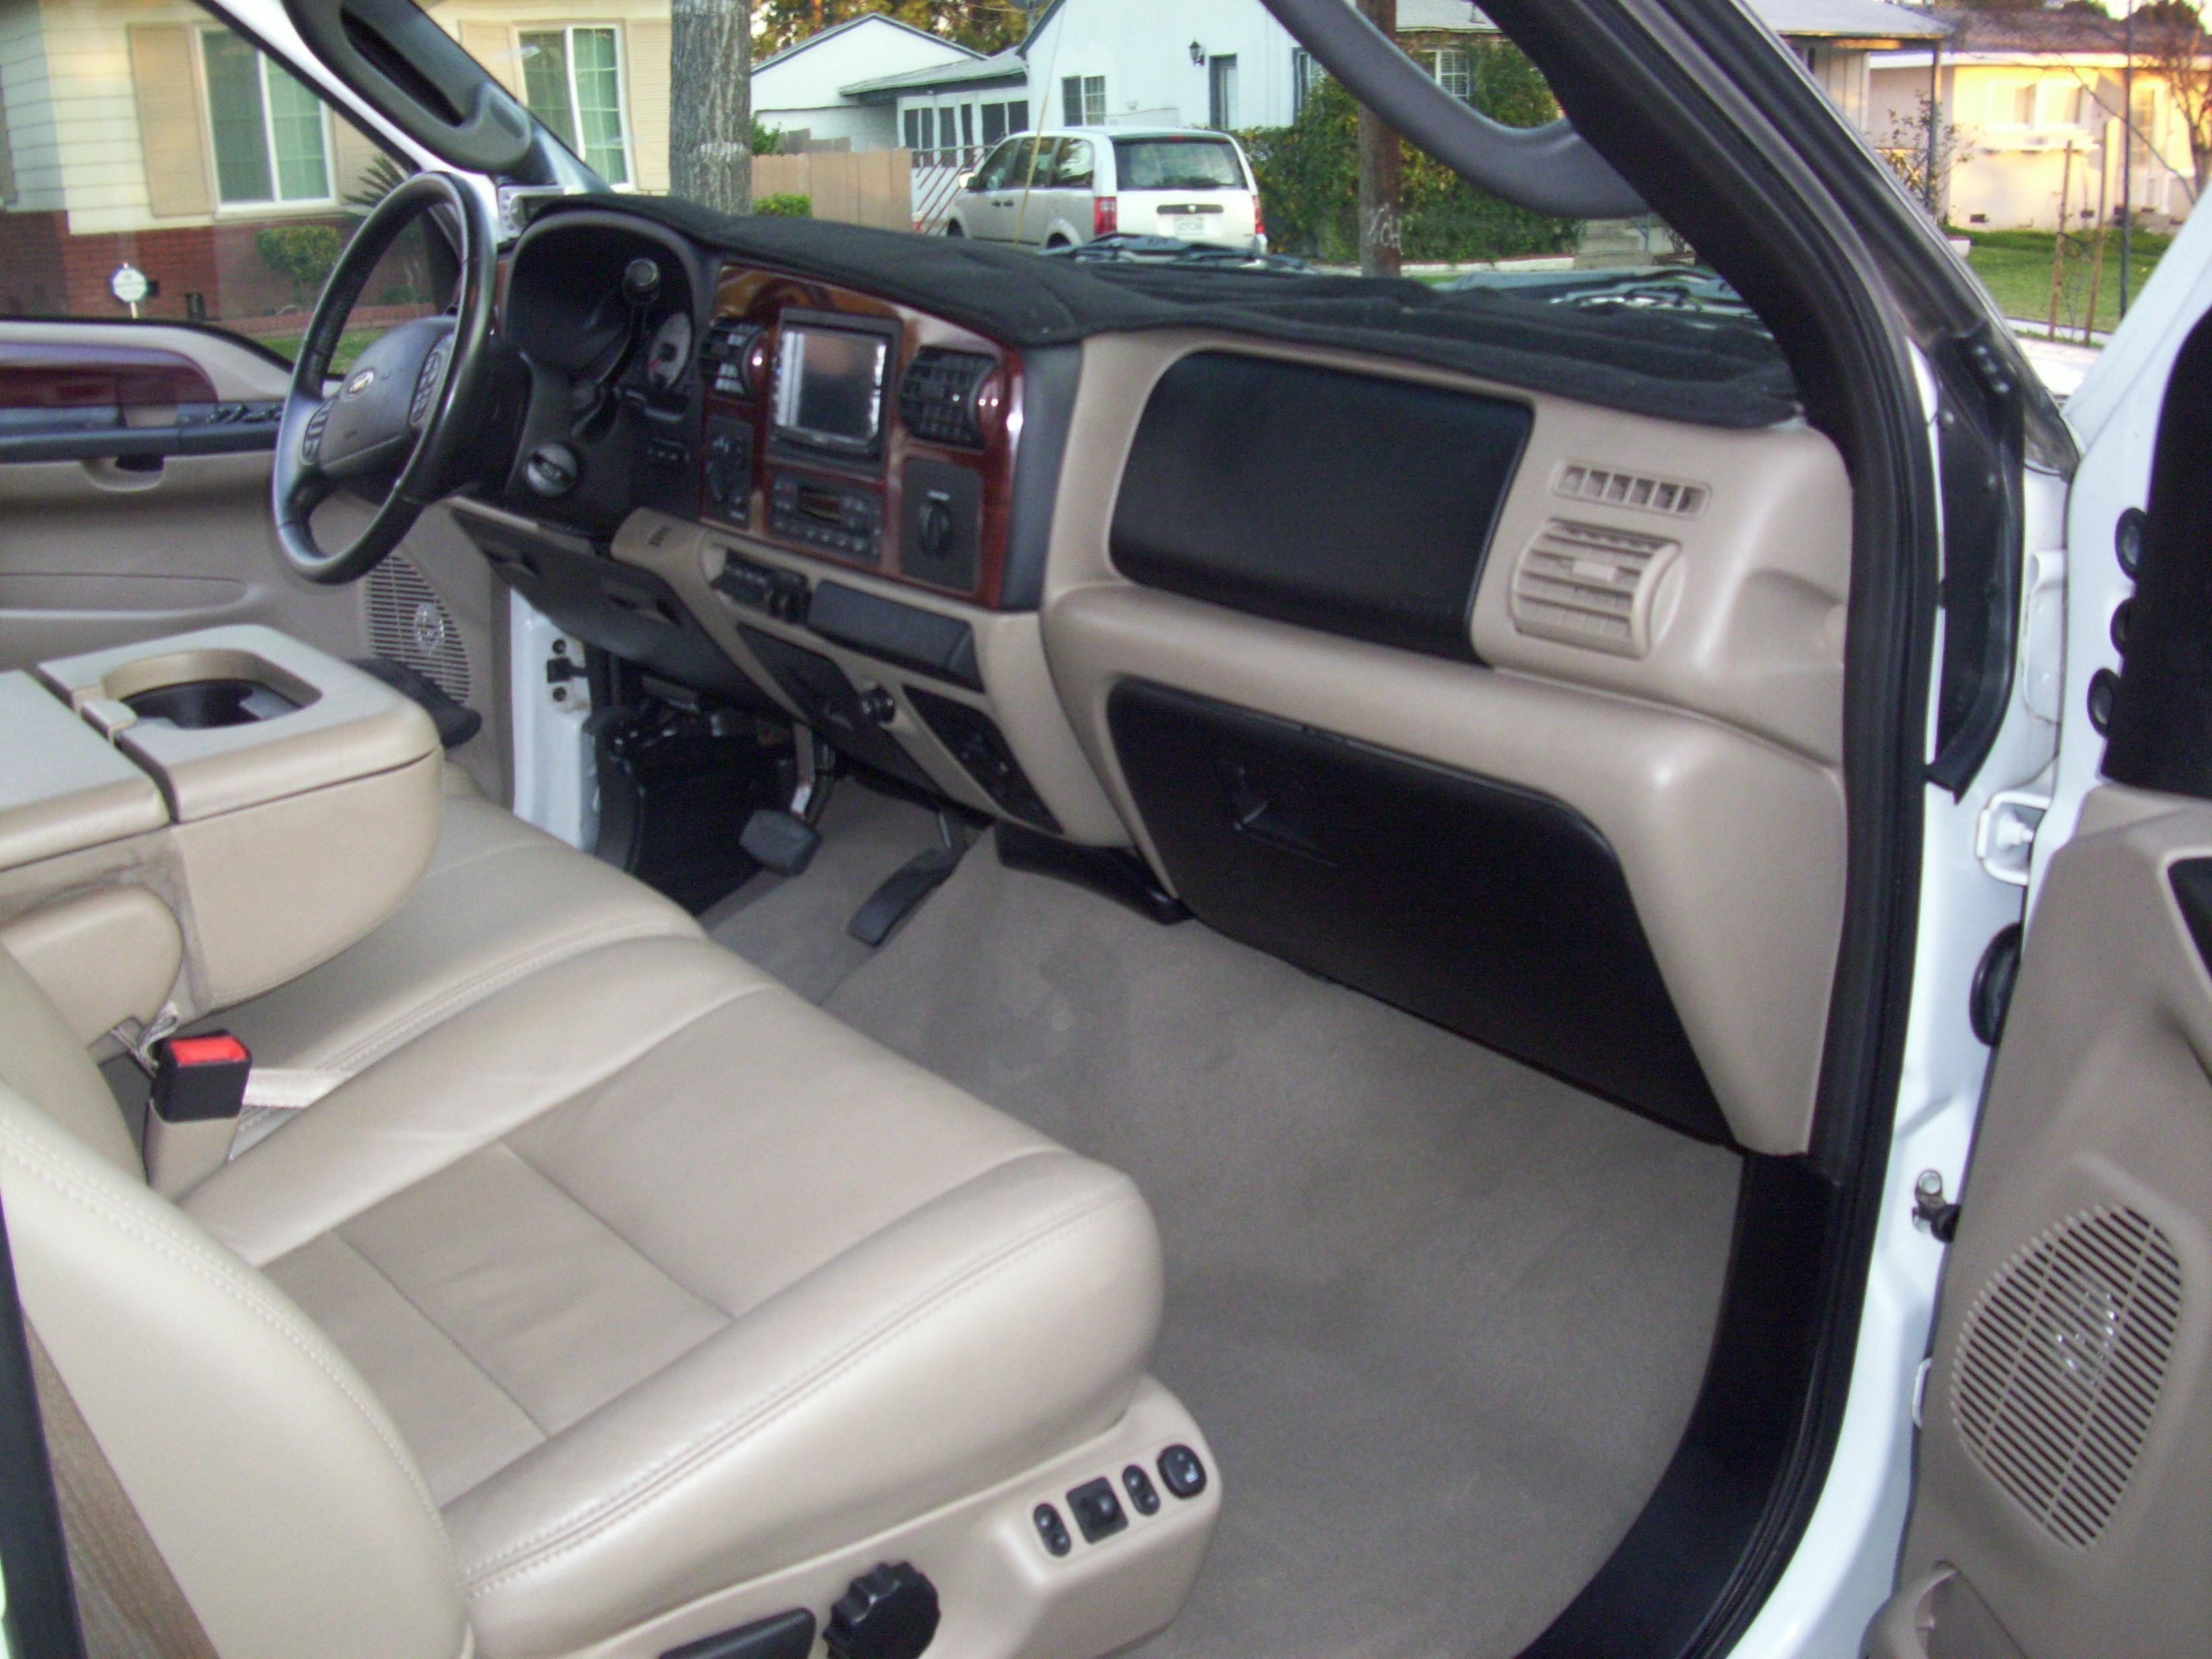 4X4 Van For Sale >> 2006 Ford F350 Crew Cab Fx4 Lb White Lariat Lifted., 6.0 Diesel 4x4 Low Mileage - Kawasaki Teryx ...